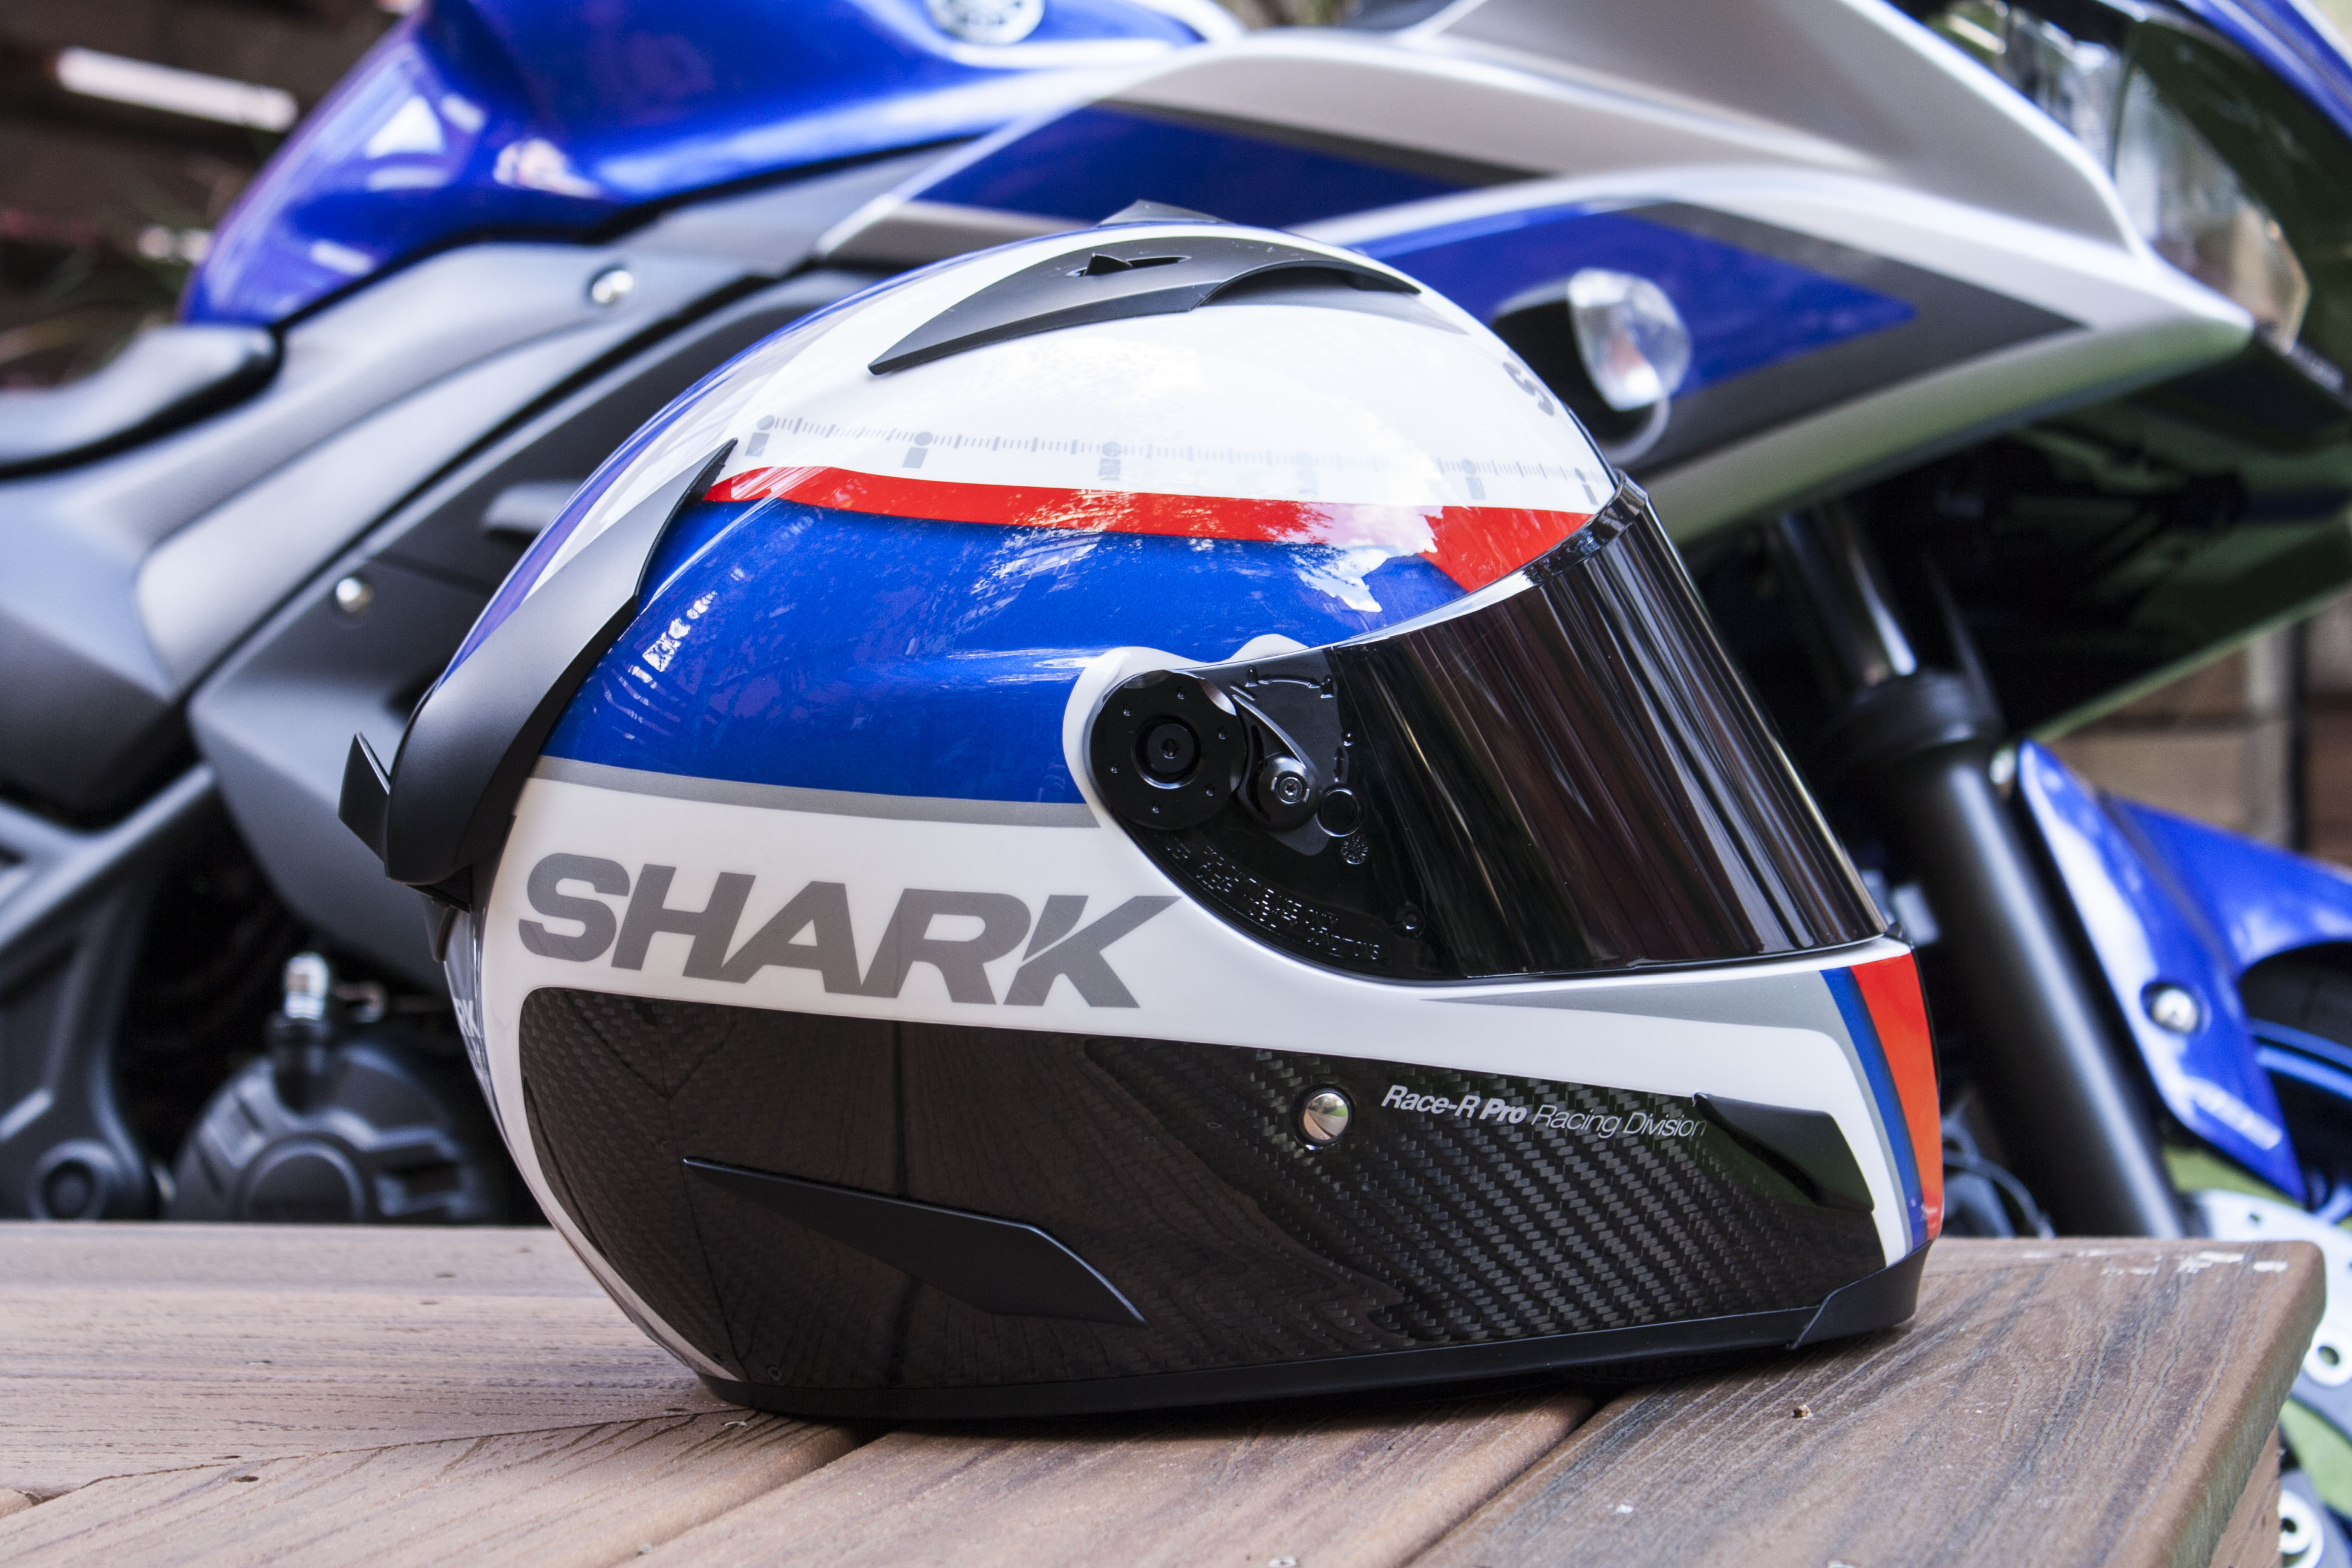 review shark race r pro carbon visordown. Black Bedroom Furniture Sets. Home Design Ideas